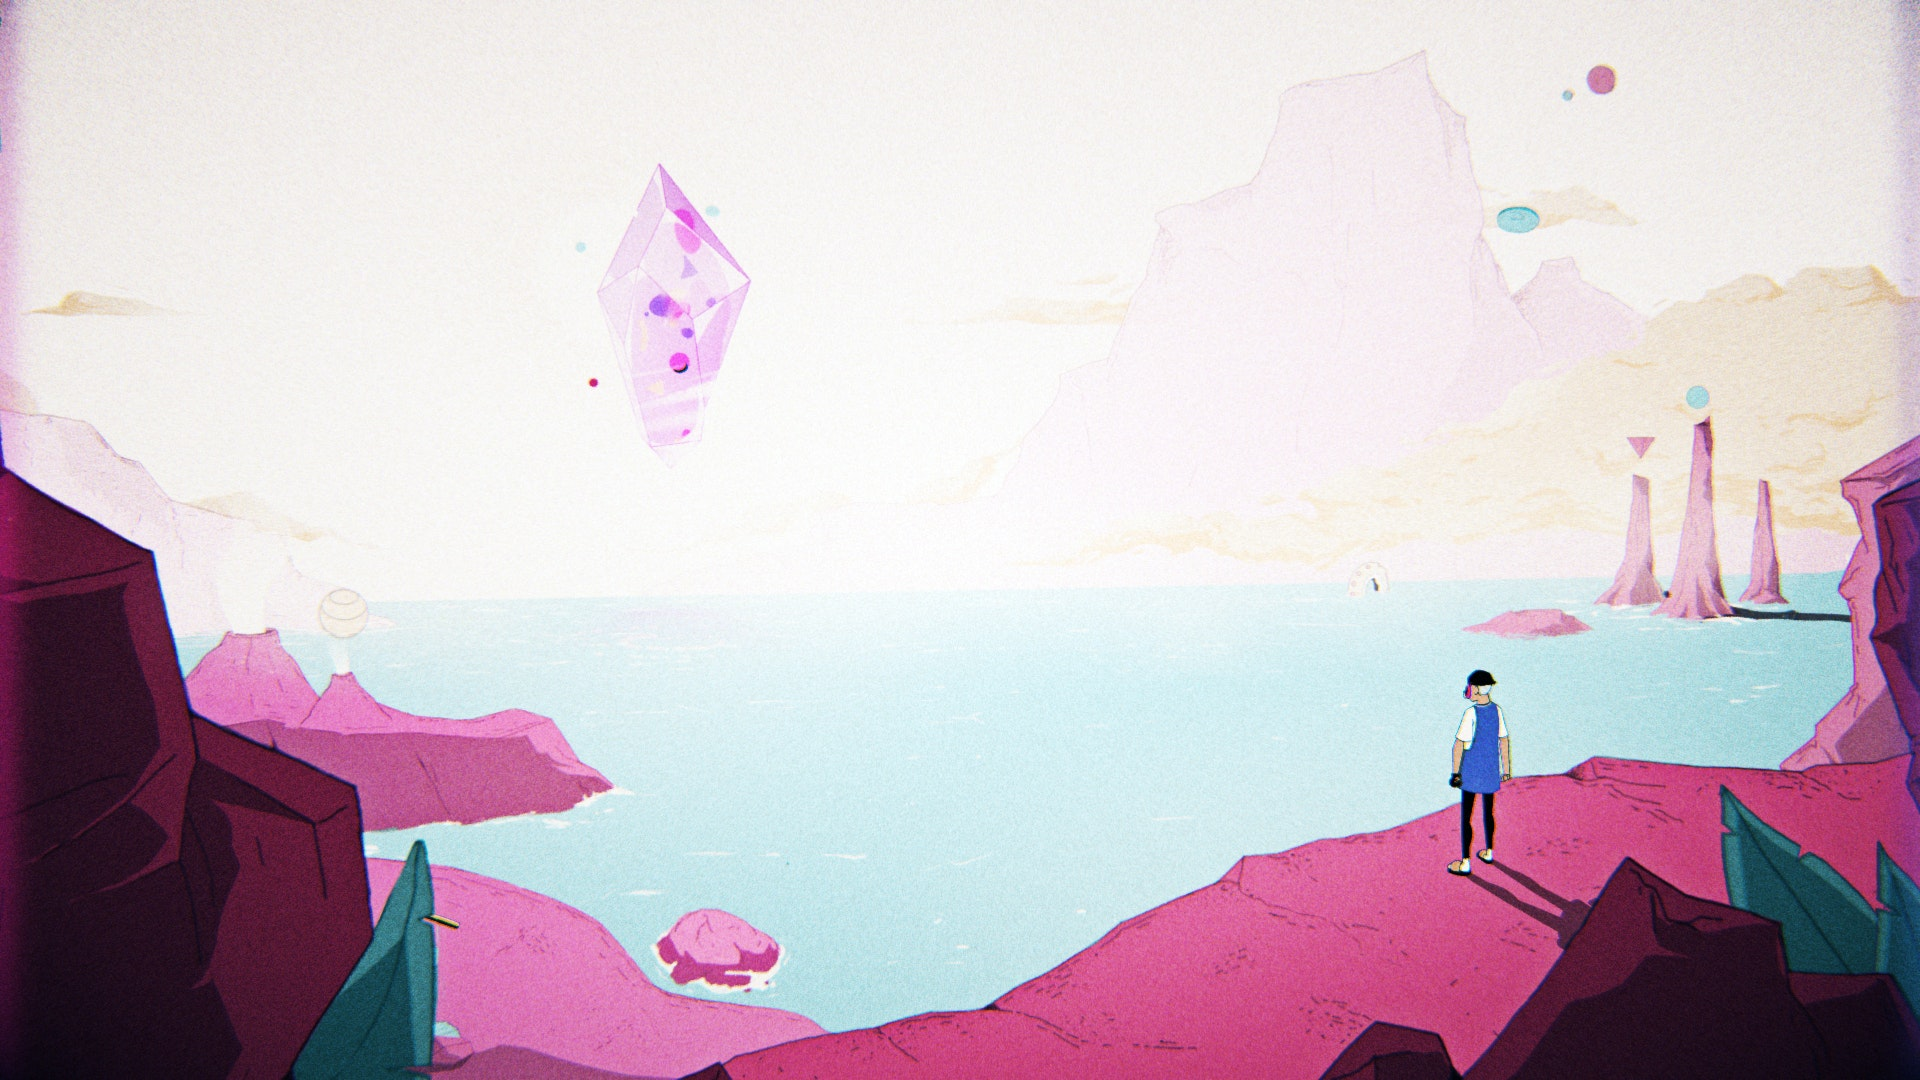 Illustration of a surrealist landscape with a levitating diamond